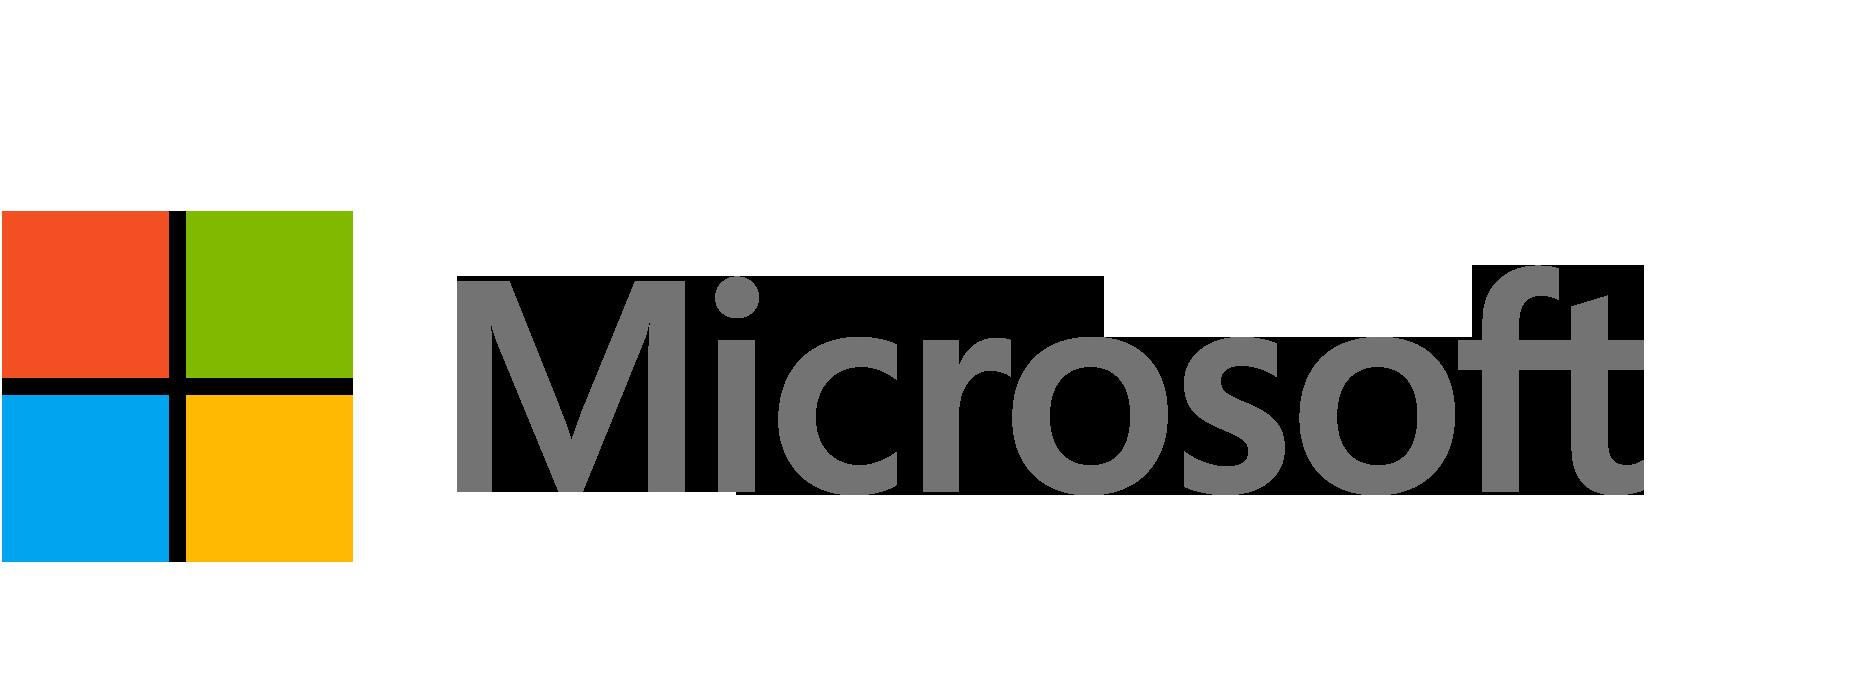 Microsoft-Logo-PNG VR AR Global Summit VRARA.png